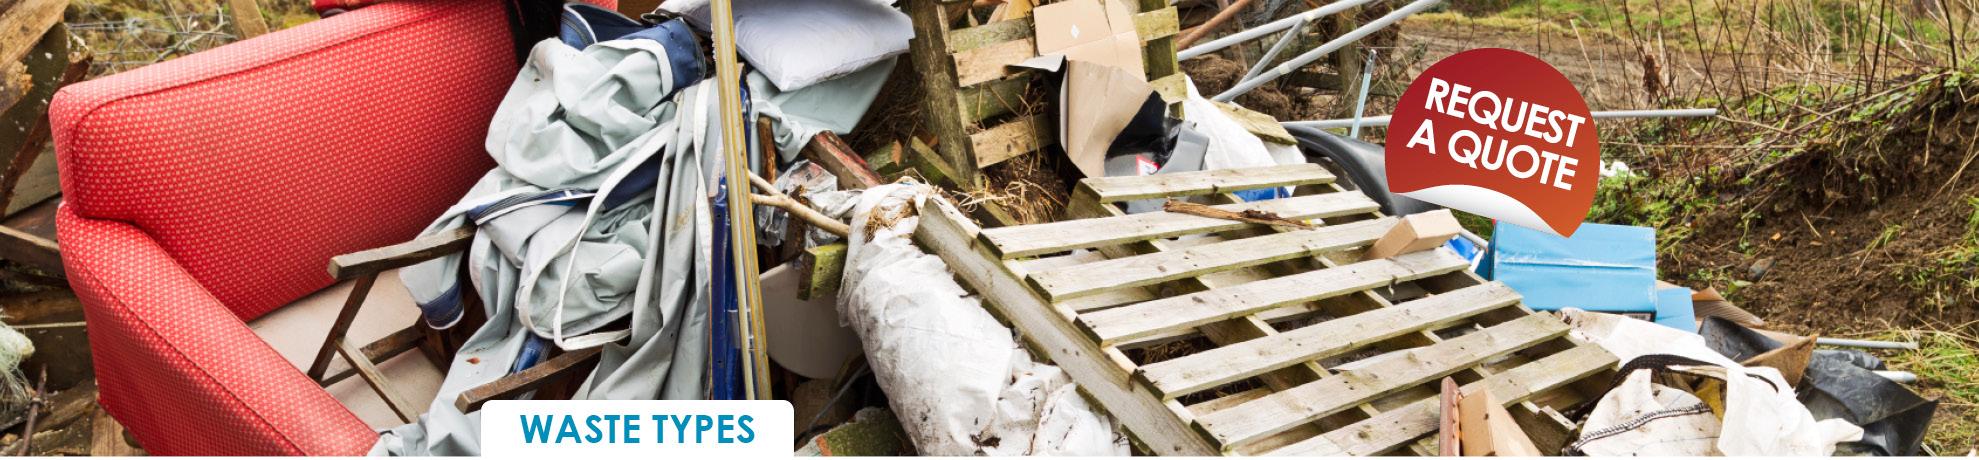 rubbish removal, mobile skip bins, hoarders